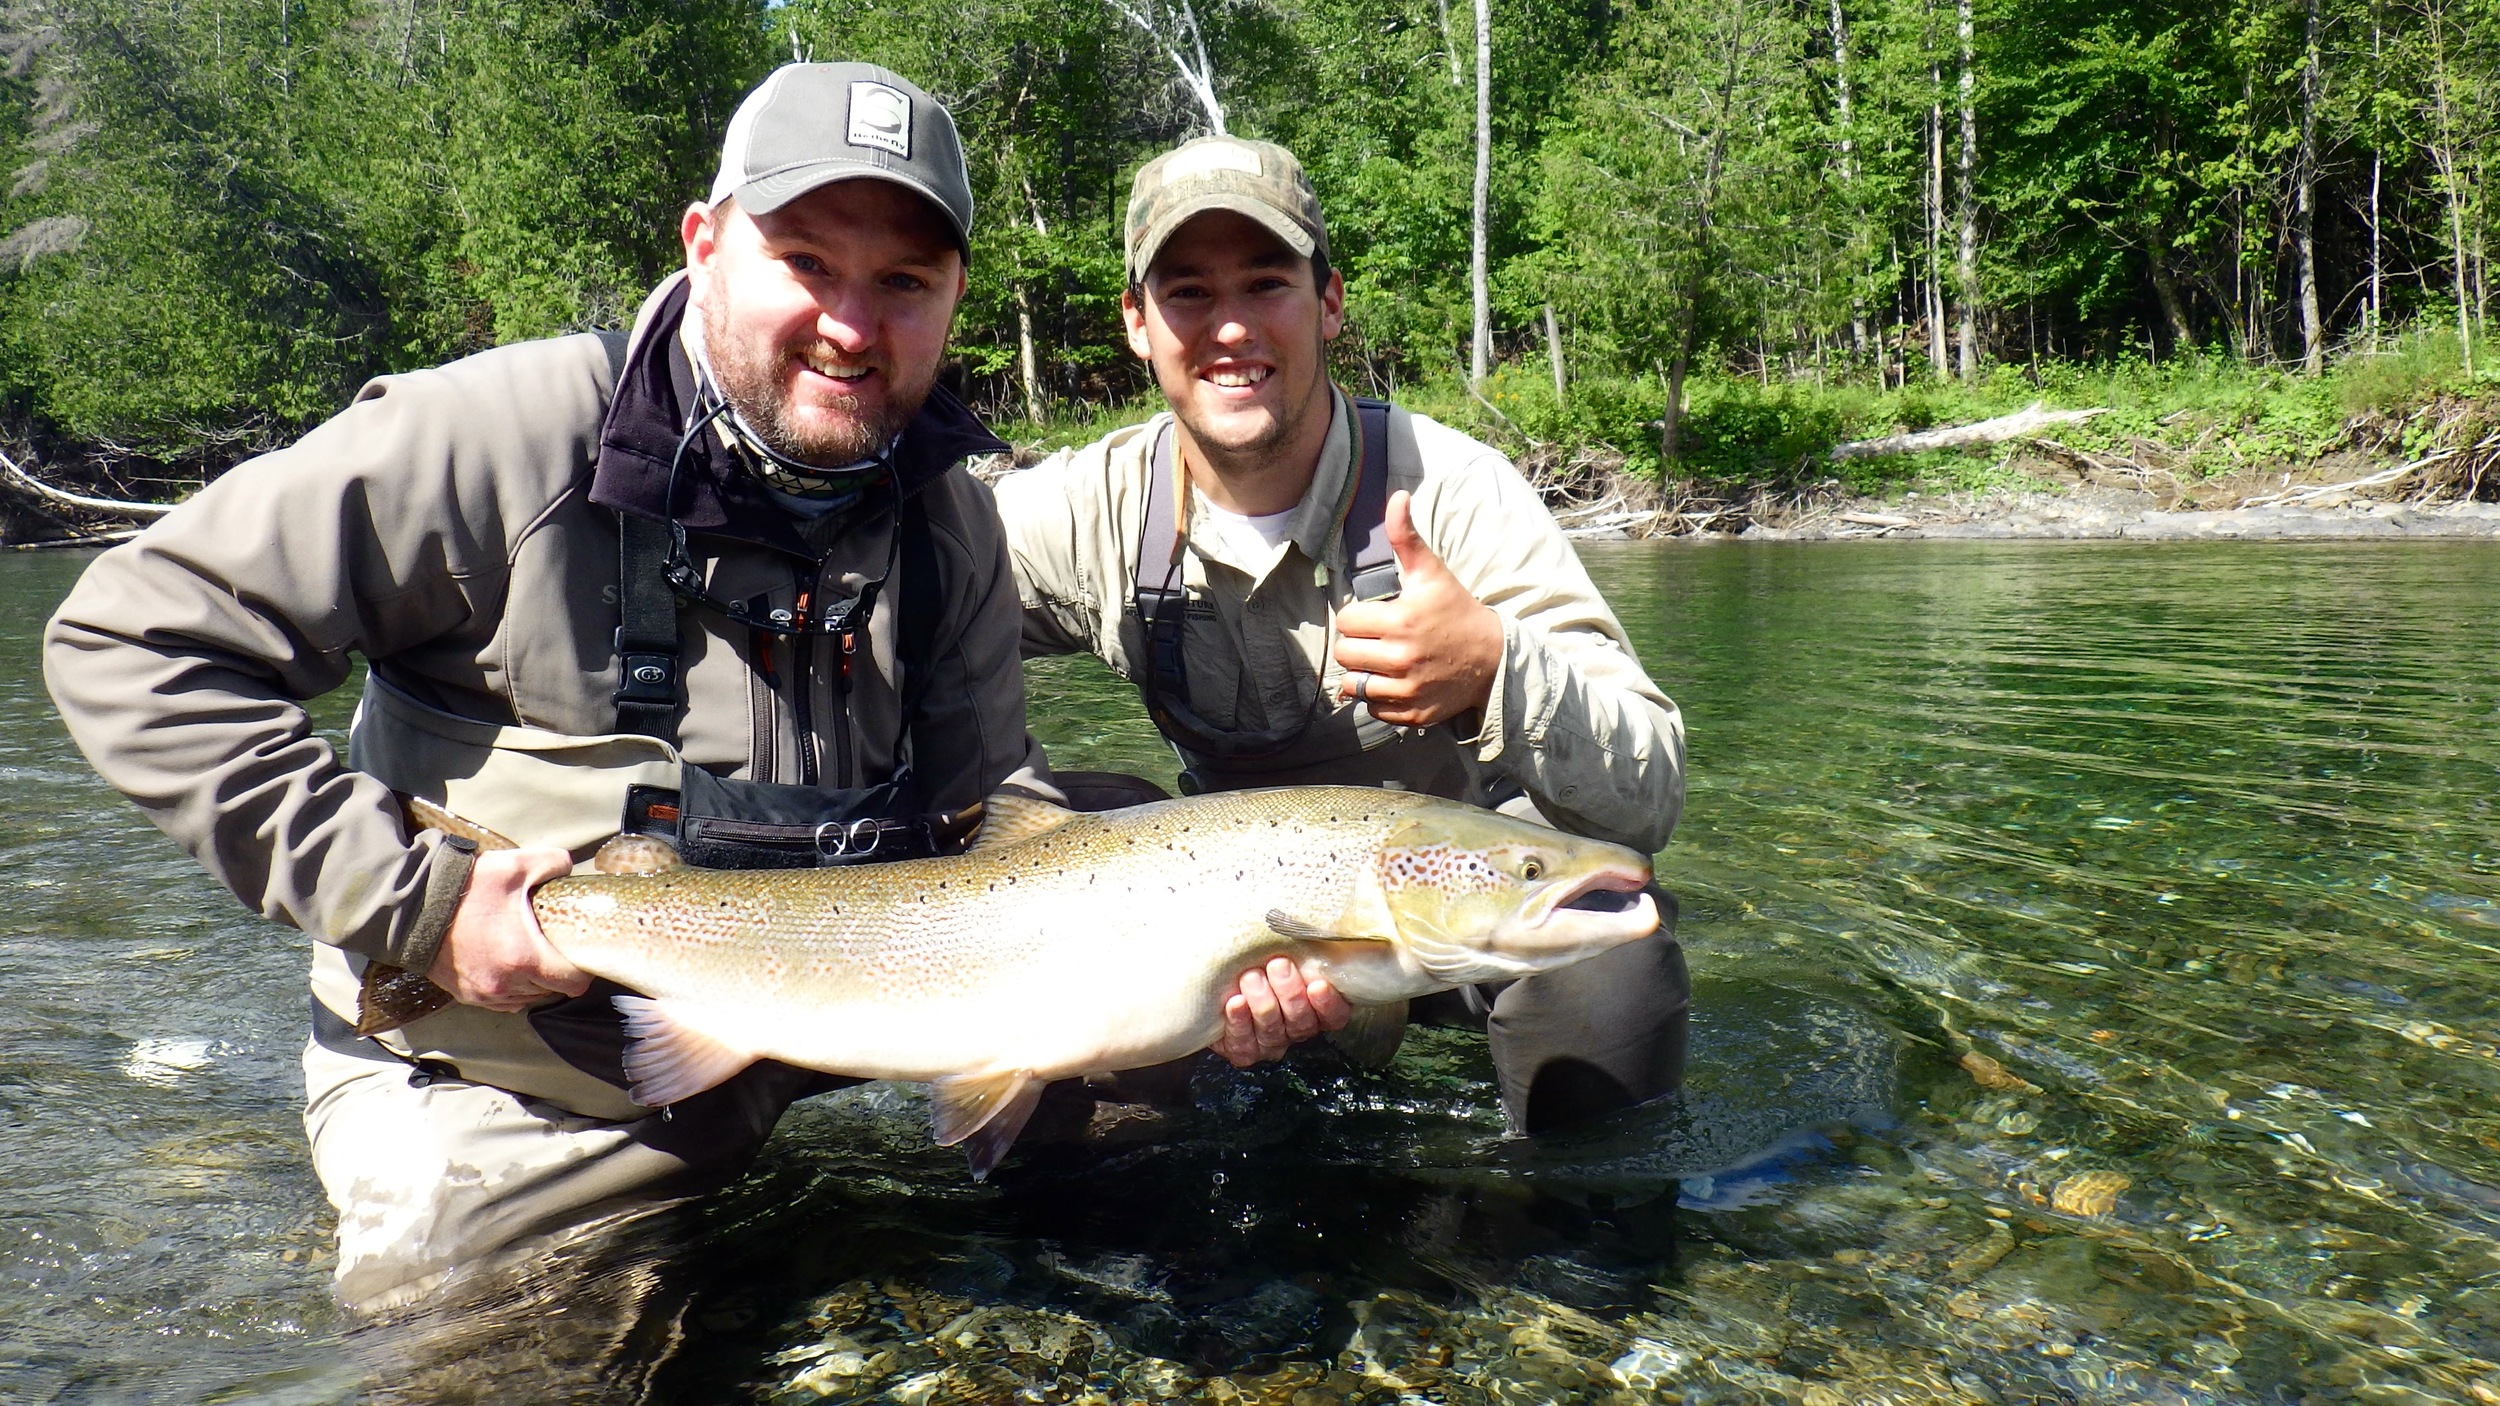 Matthew Gordon (Left) and Camp Bonaventure guide Robert Benwell pose with a nice one from the Petite. Nice salmon Matt!